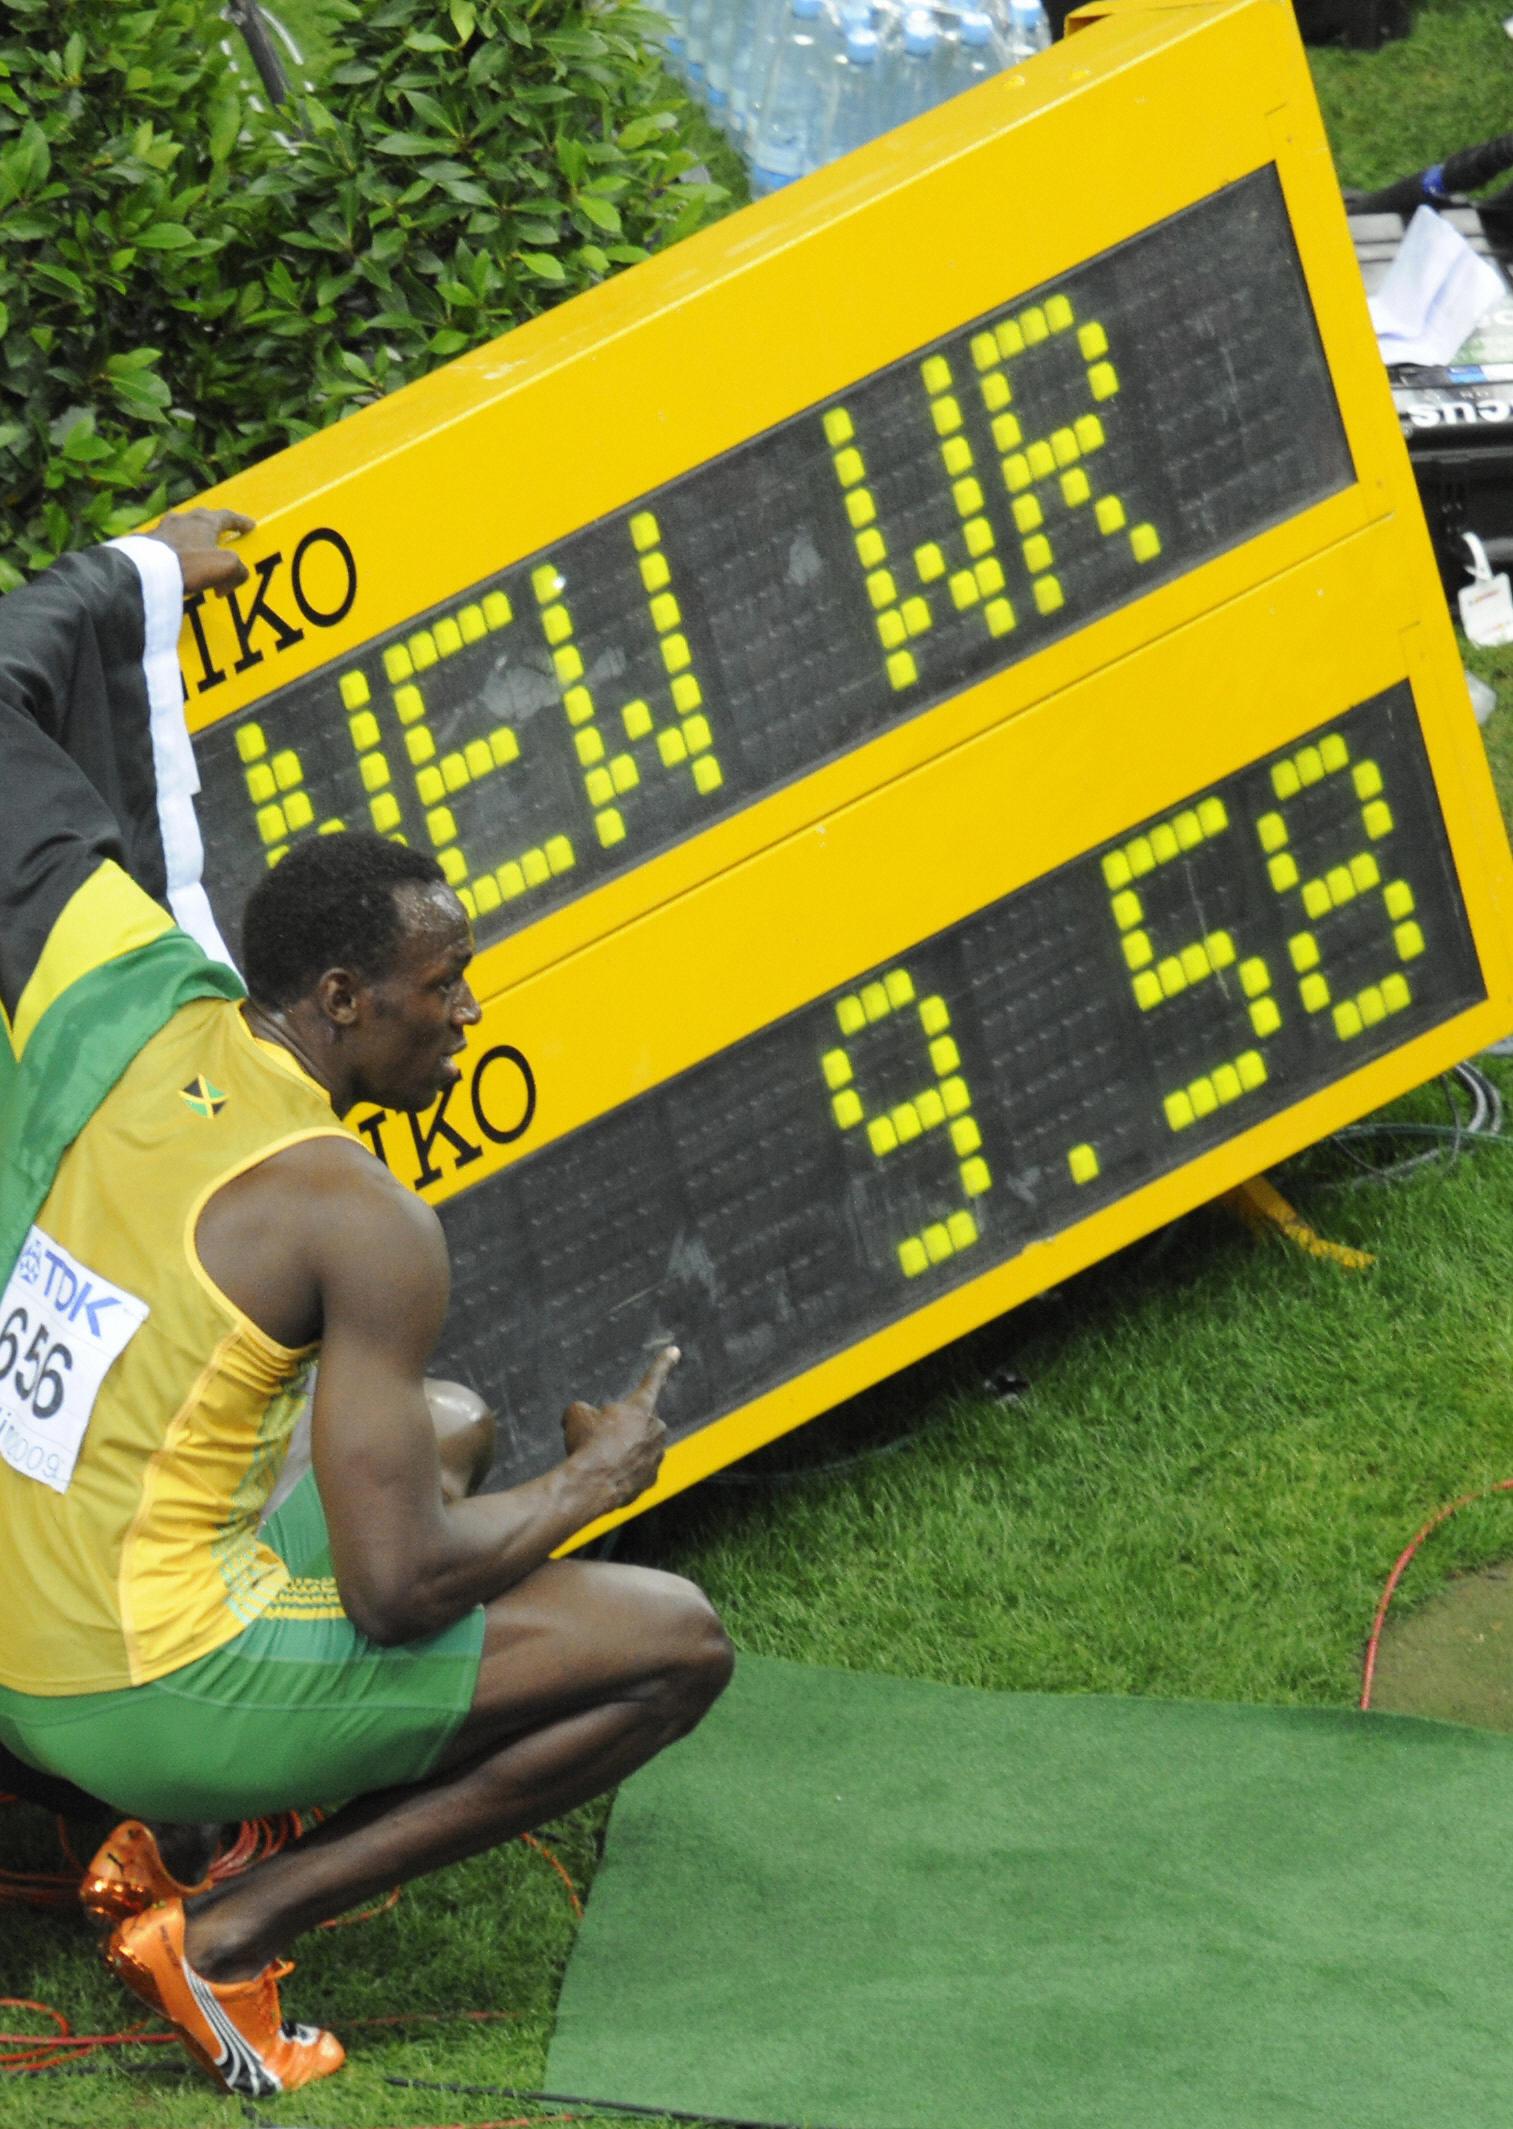 Bolt has a score of 9.58.